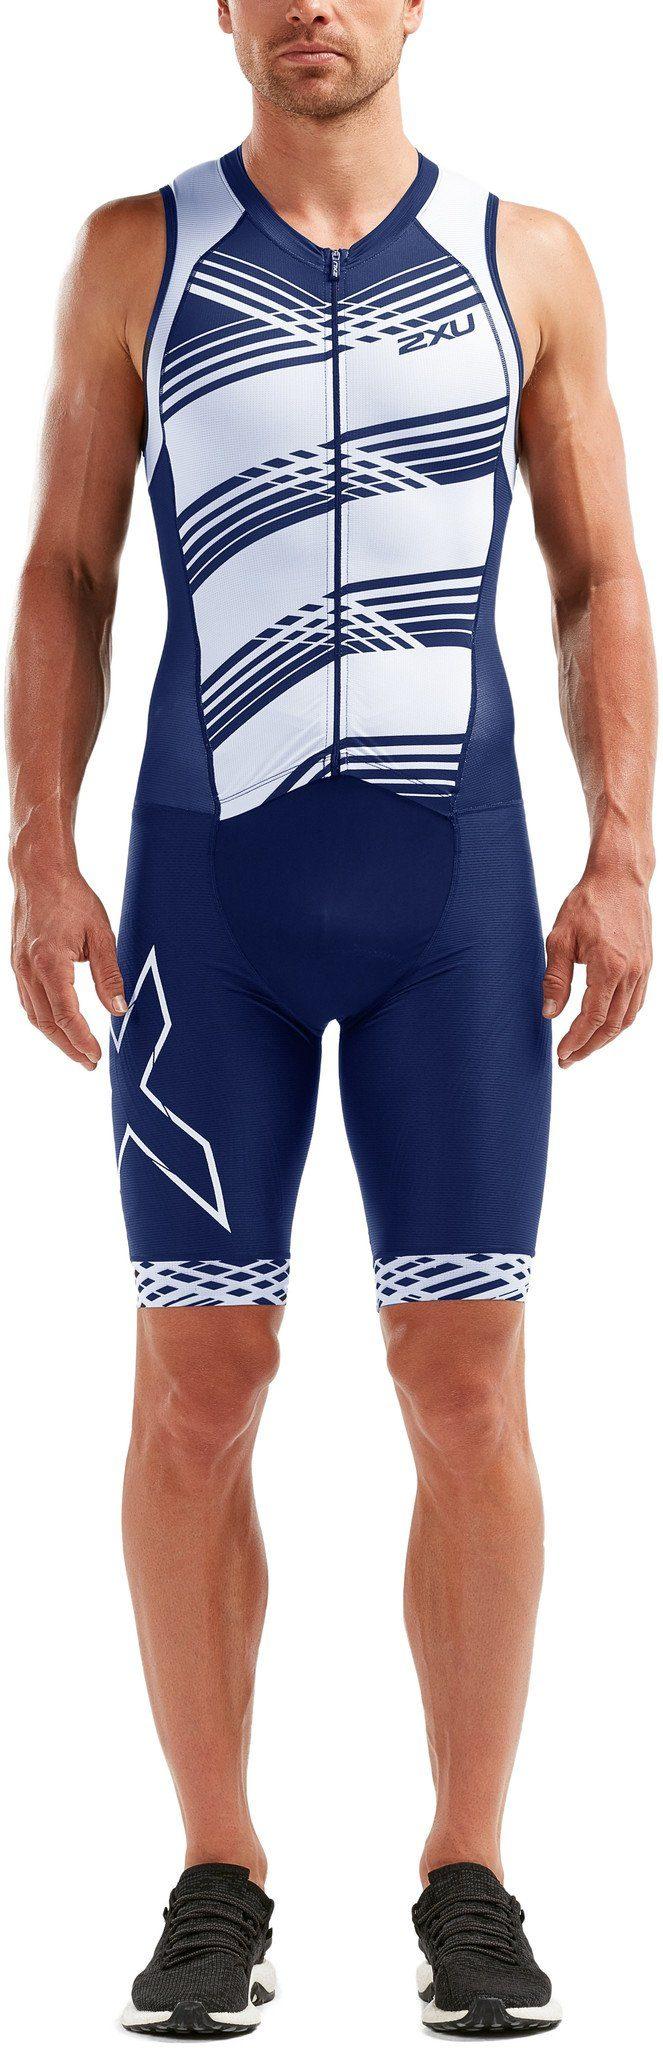 2xU Triathlonbekleidung »Compression Full Zip Trisuit Men«